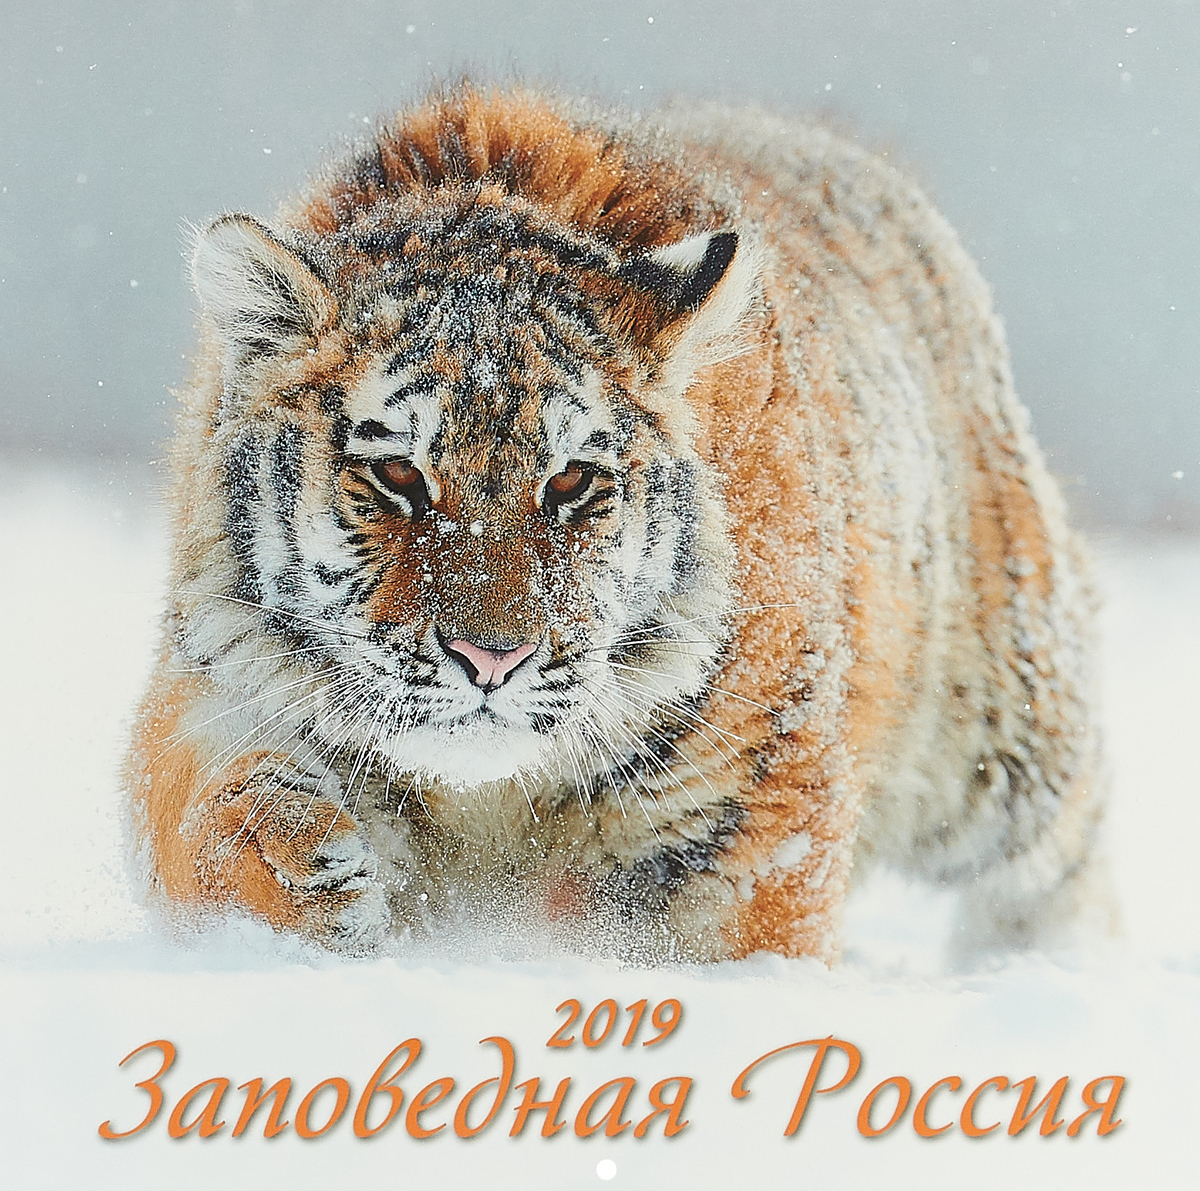 Заповедная Россия. Календарь (285*285) 2019 ISBN: 4627130414703 sitemap 285 xml